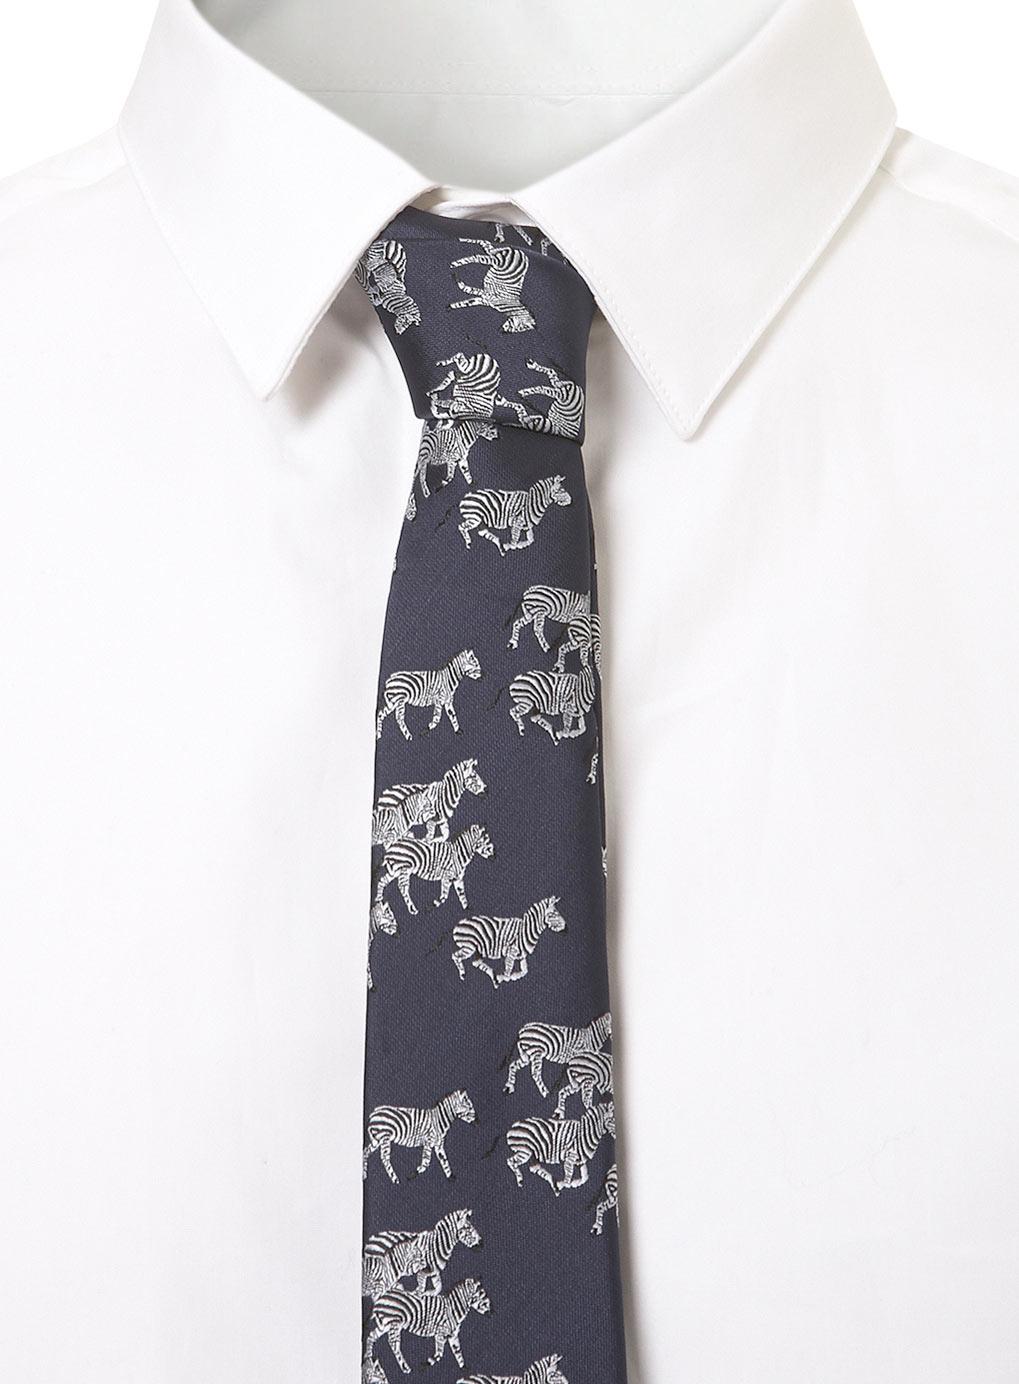 99a1d85af309 TOPMAN Navy Zebra Motif Tie in Blue for Men - Lyst